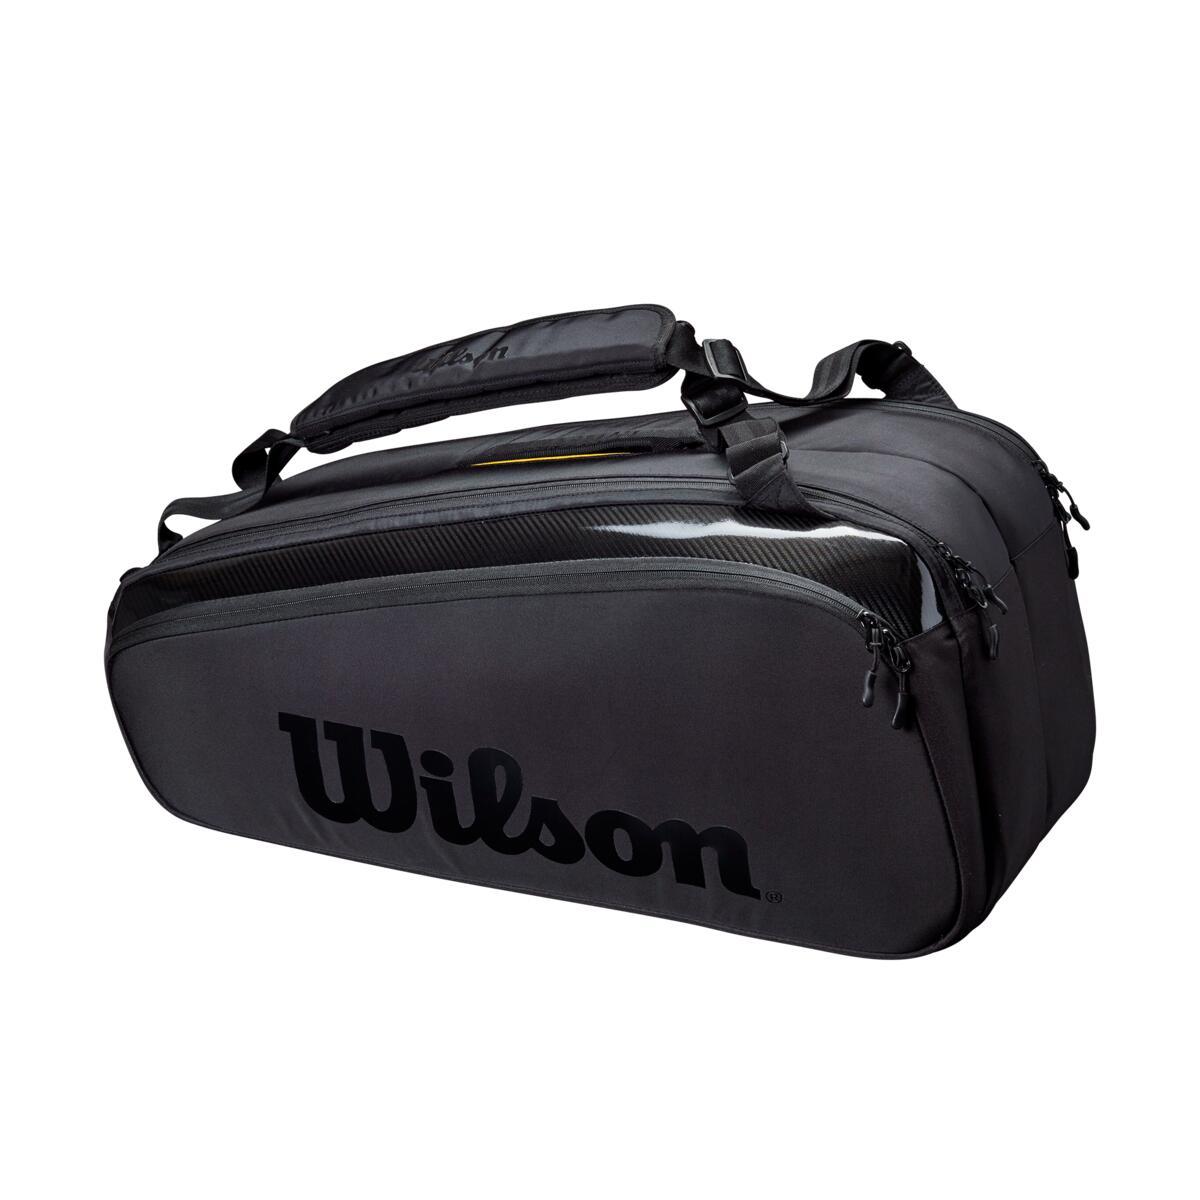 Pro Staff Bags